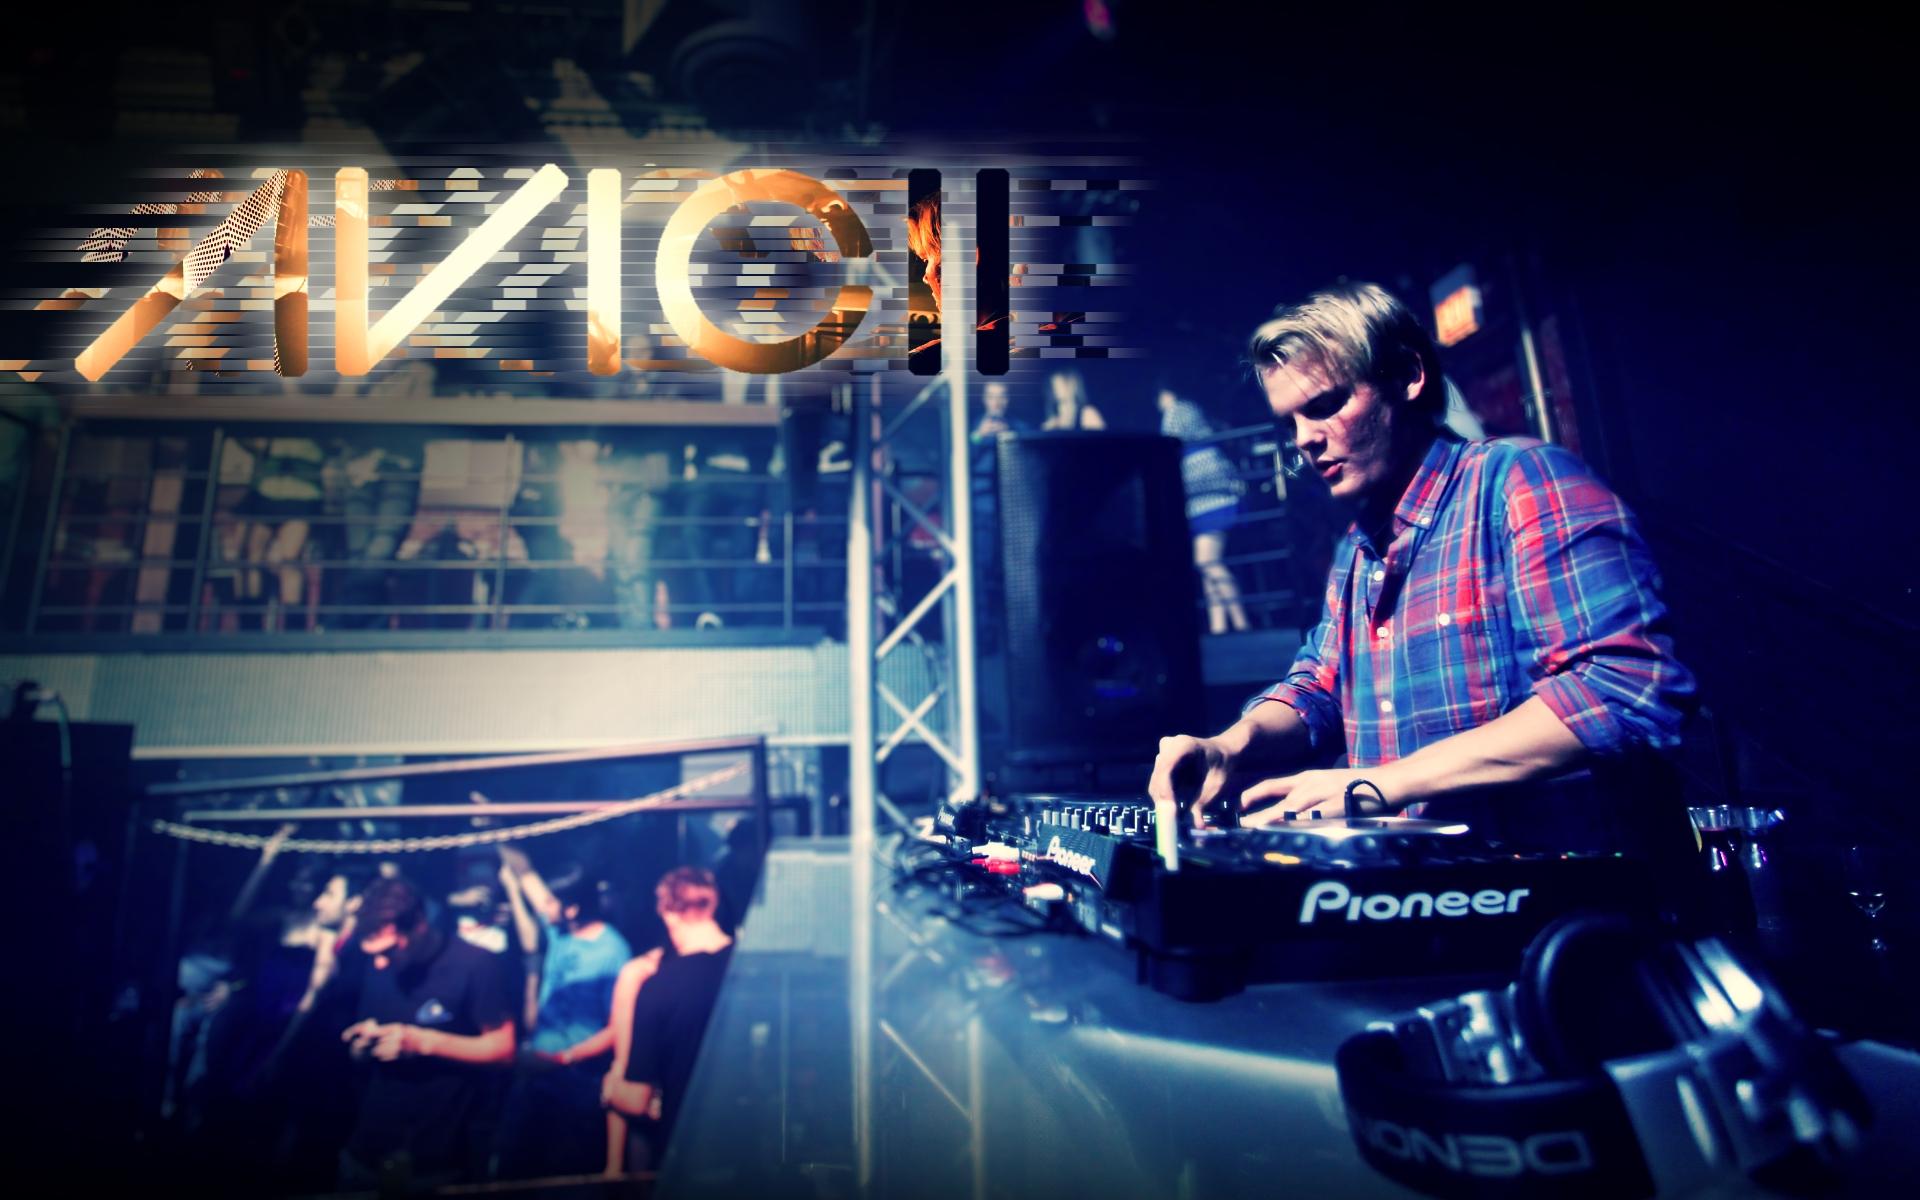 Music - DJ House Tim Berg Music Wallpaper